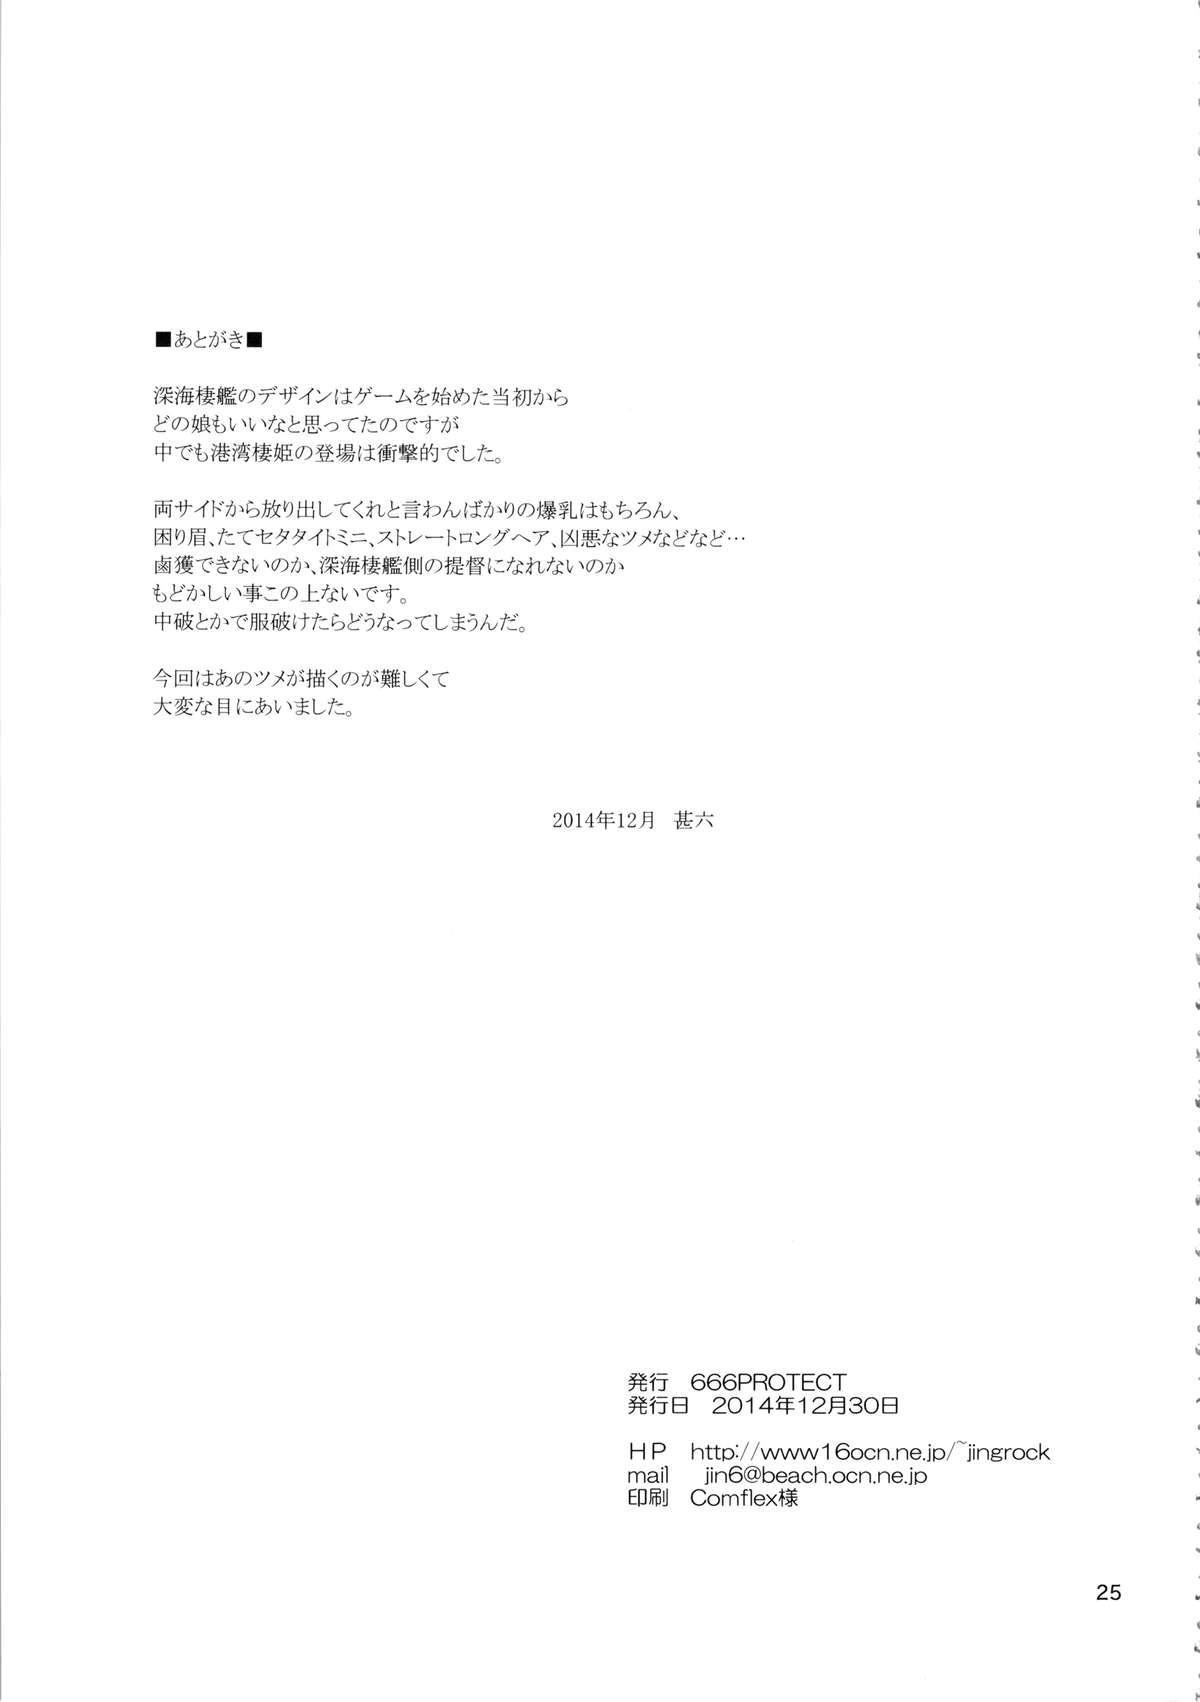 Kouwan-chan no Spy Daisakusen | Kowan's Great Undercover Plan 24